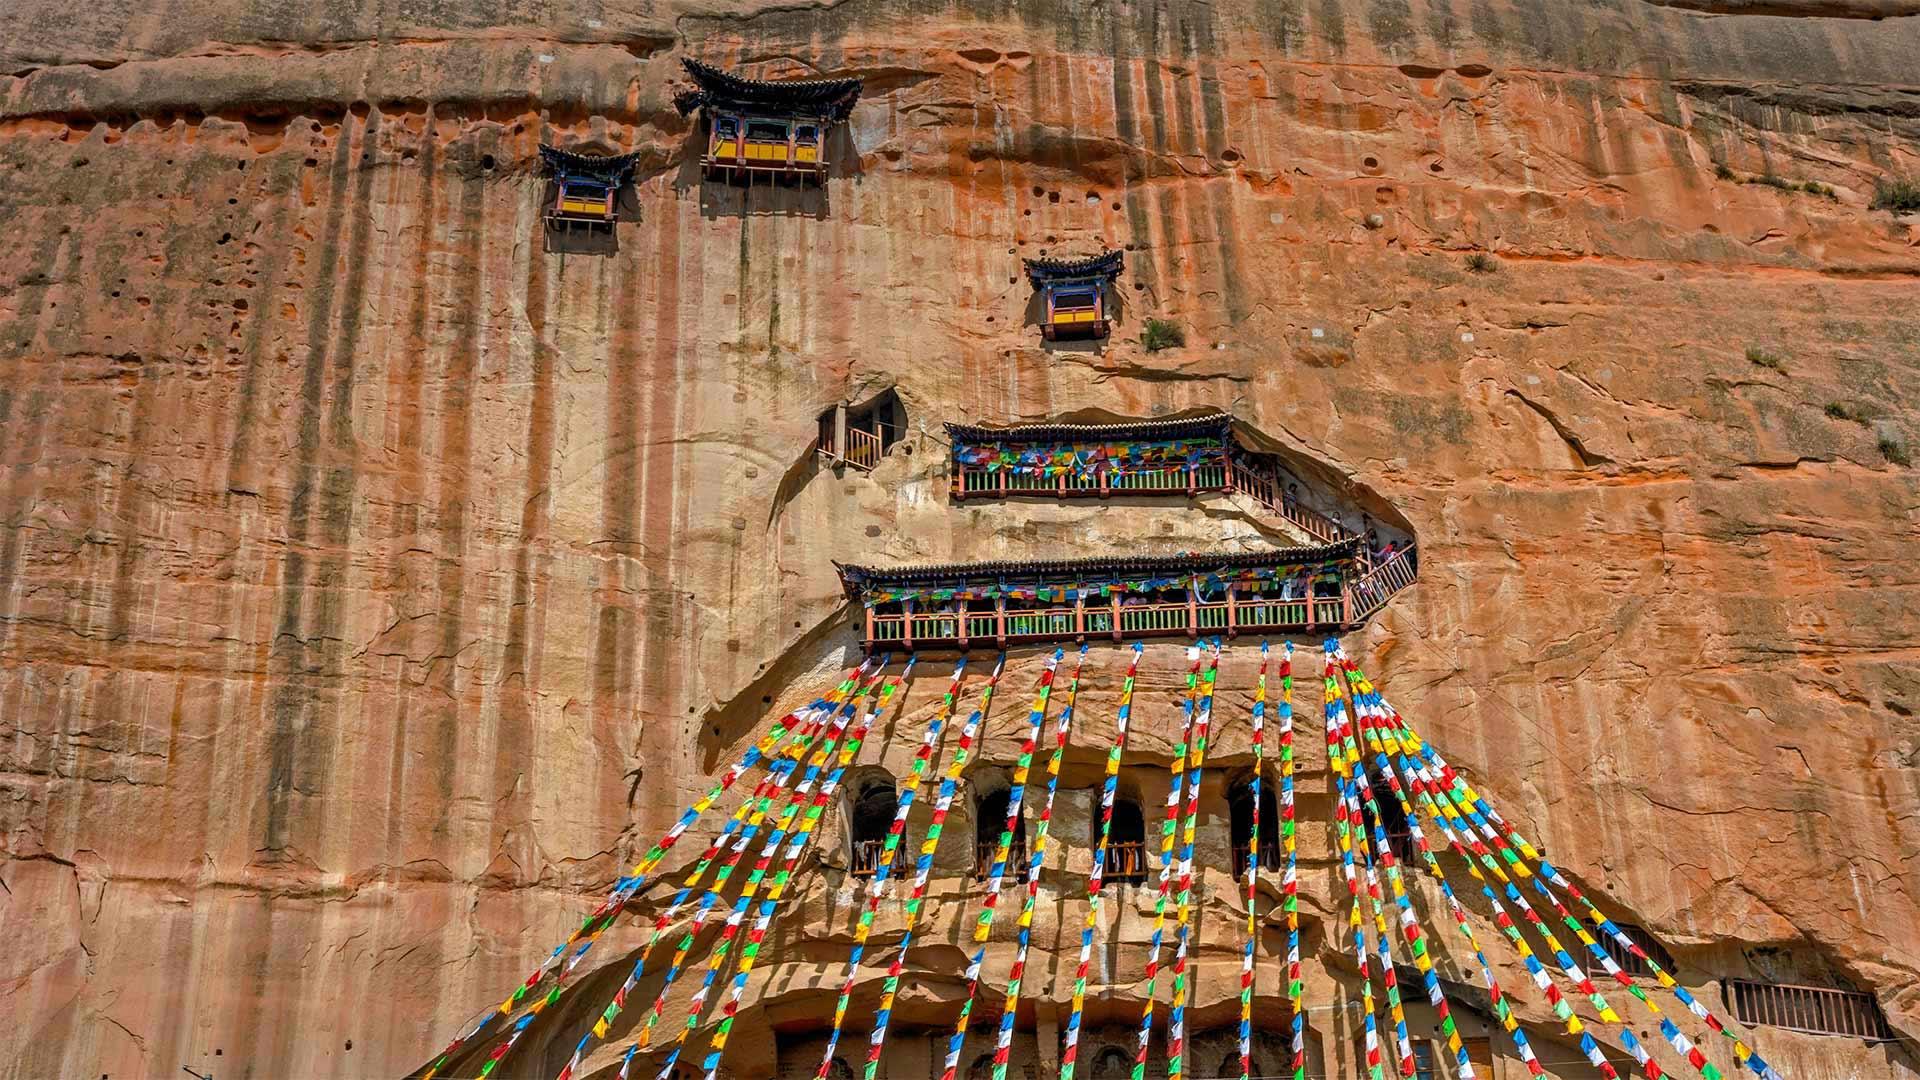 The Mati Si (Horse's Hoof Temple) and grottoes of Mati Si Scenic Area, Gansu province, China (© Ana Flašker/Alamy)